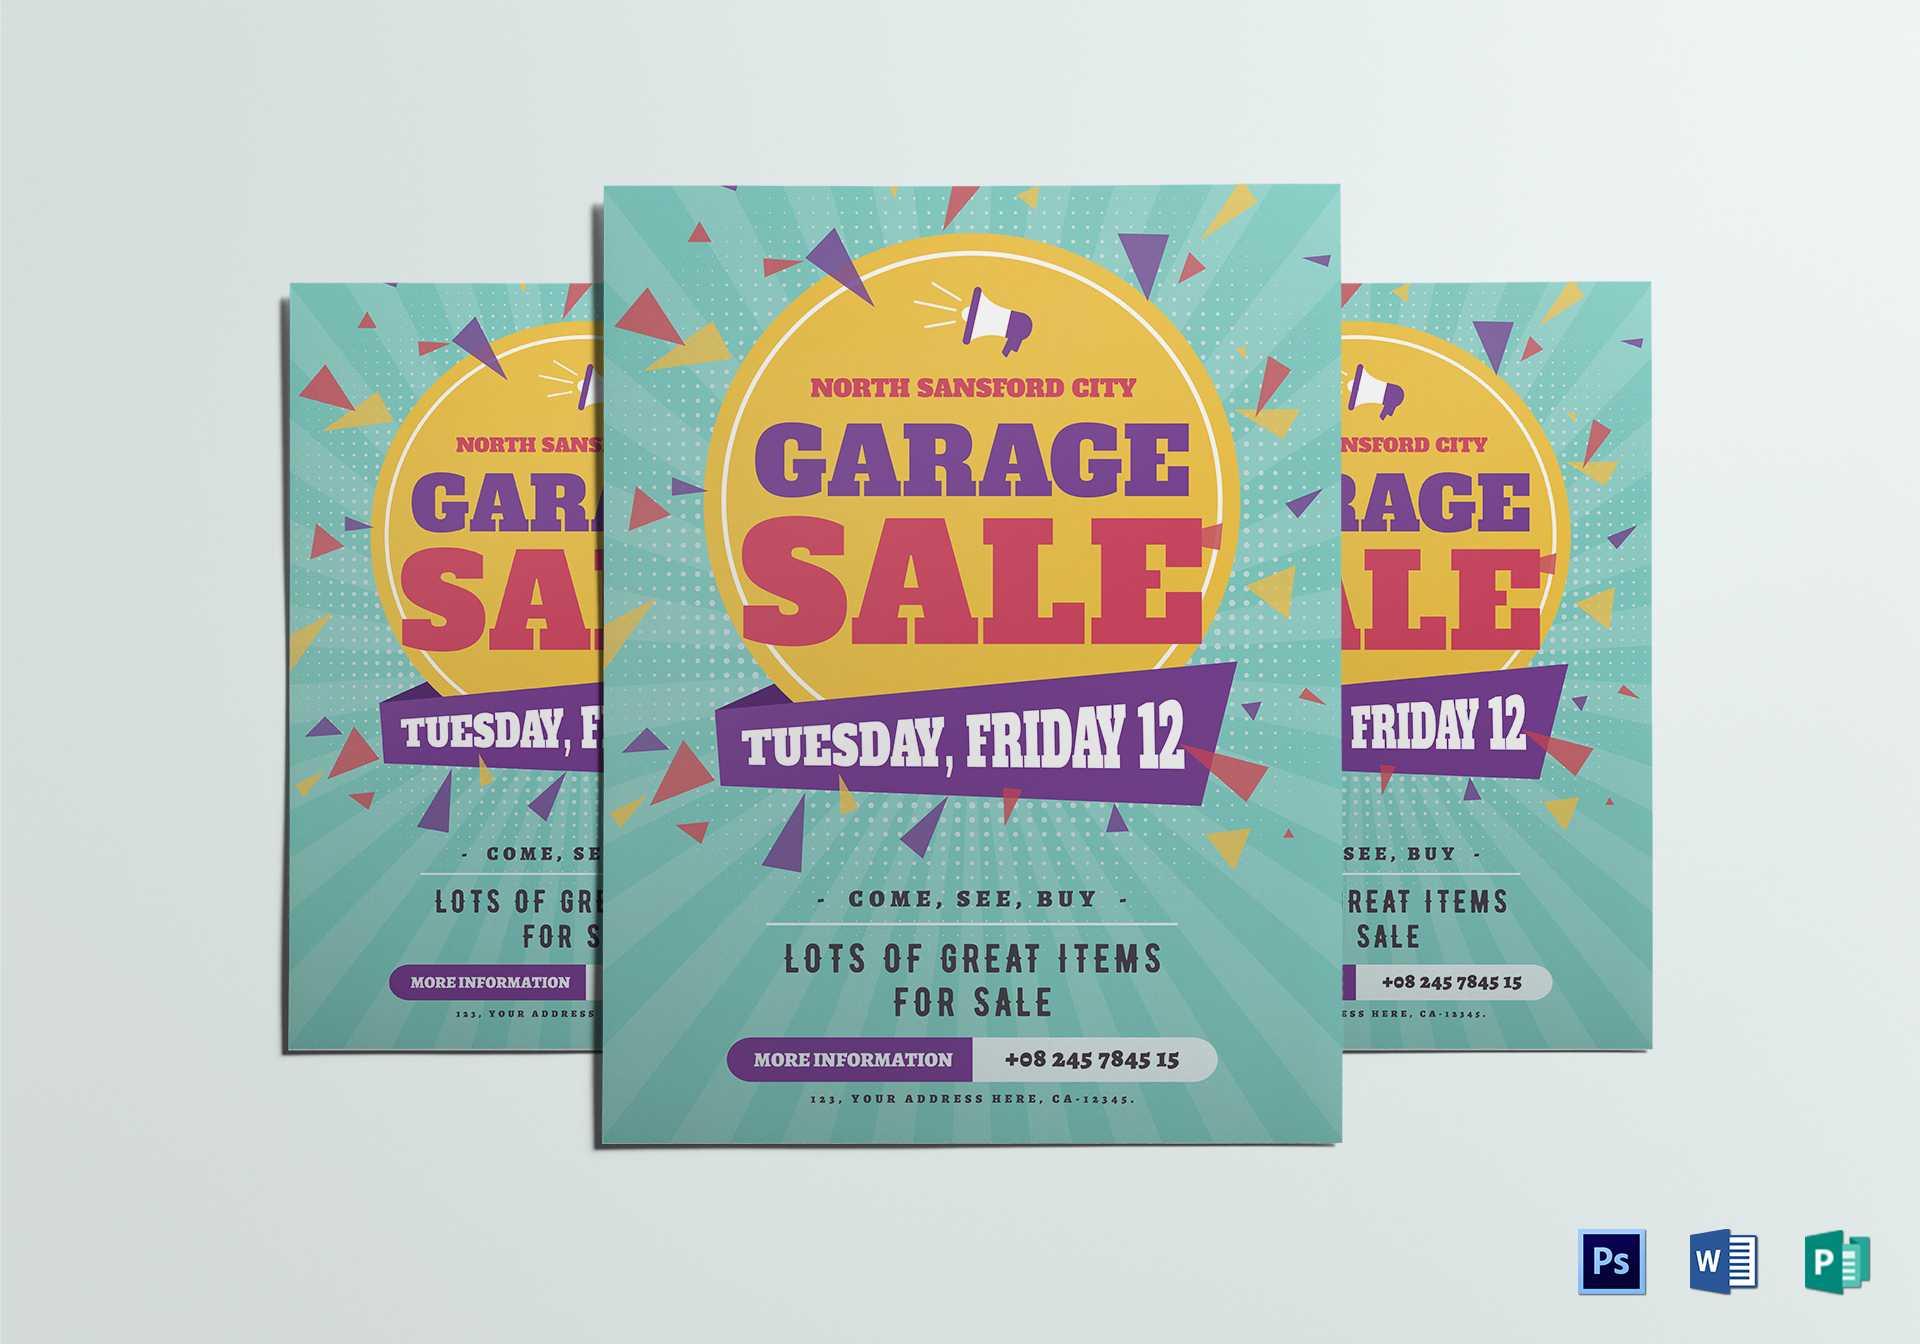 Large Garage Sale Flyer Template Intended For Garage Sale Flyer Template Word